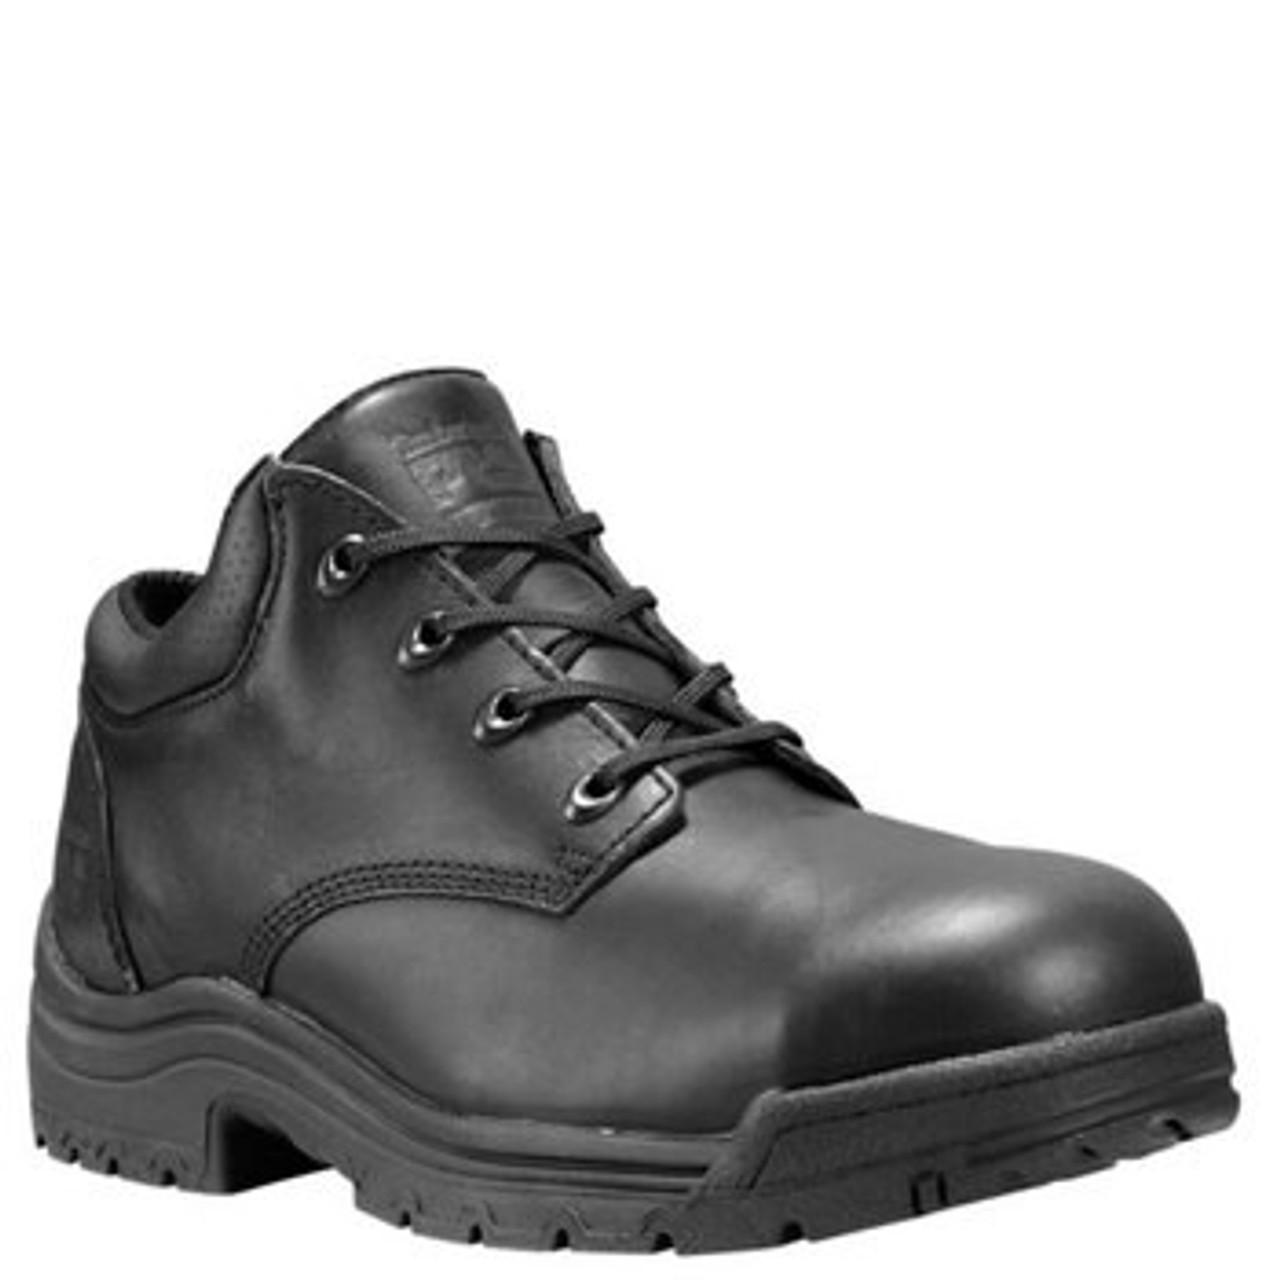 485900bc3ea Timberland Pro Titan Safety Toe Shoe Black 40044